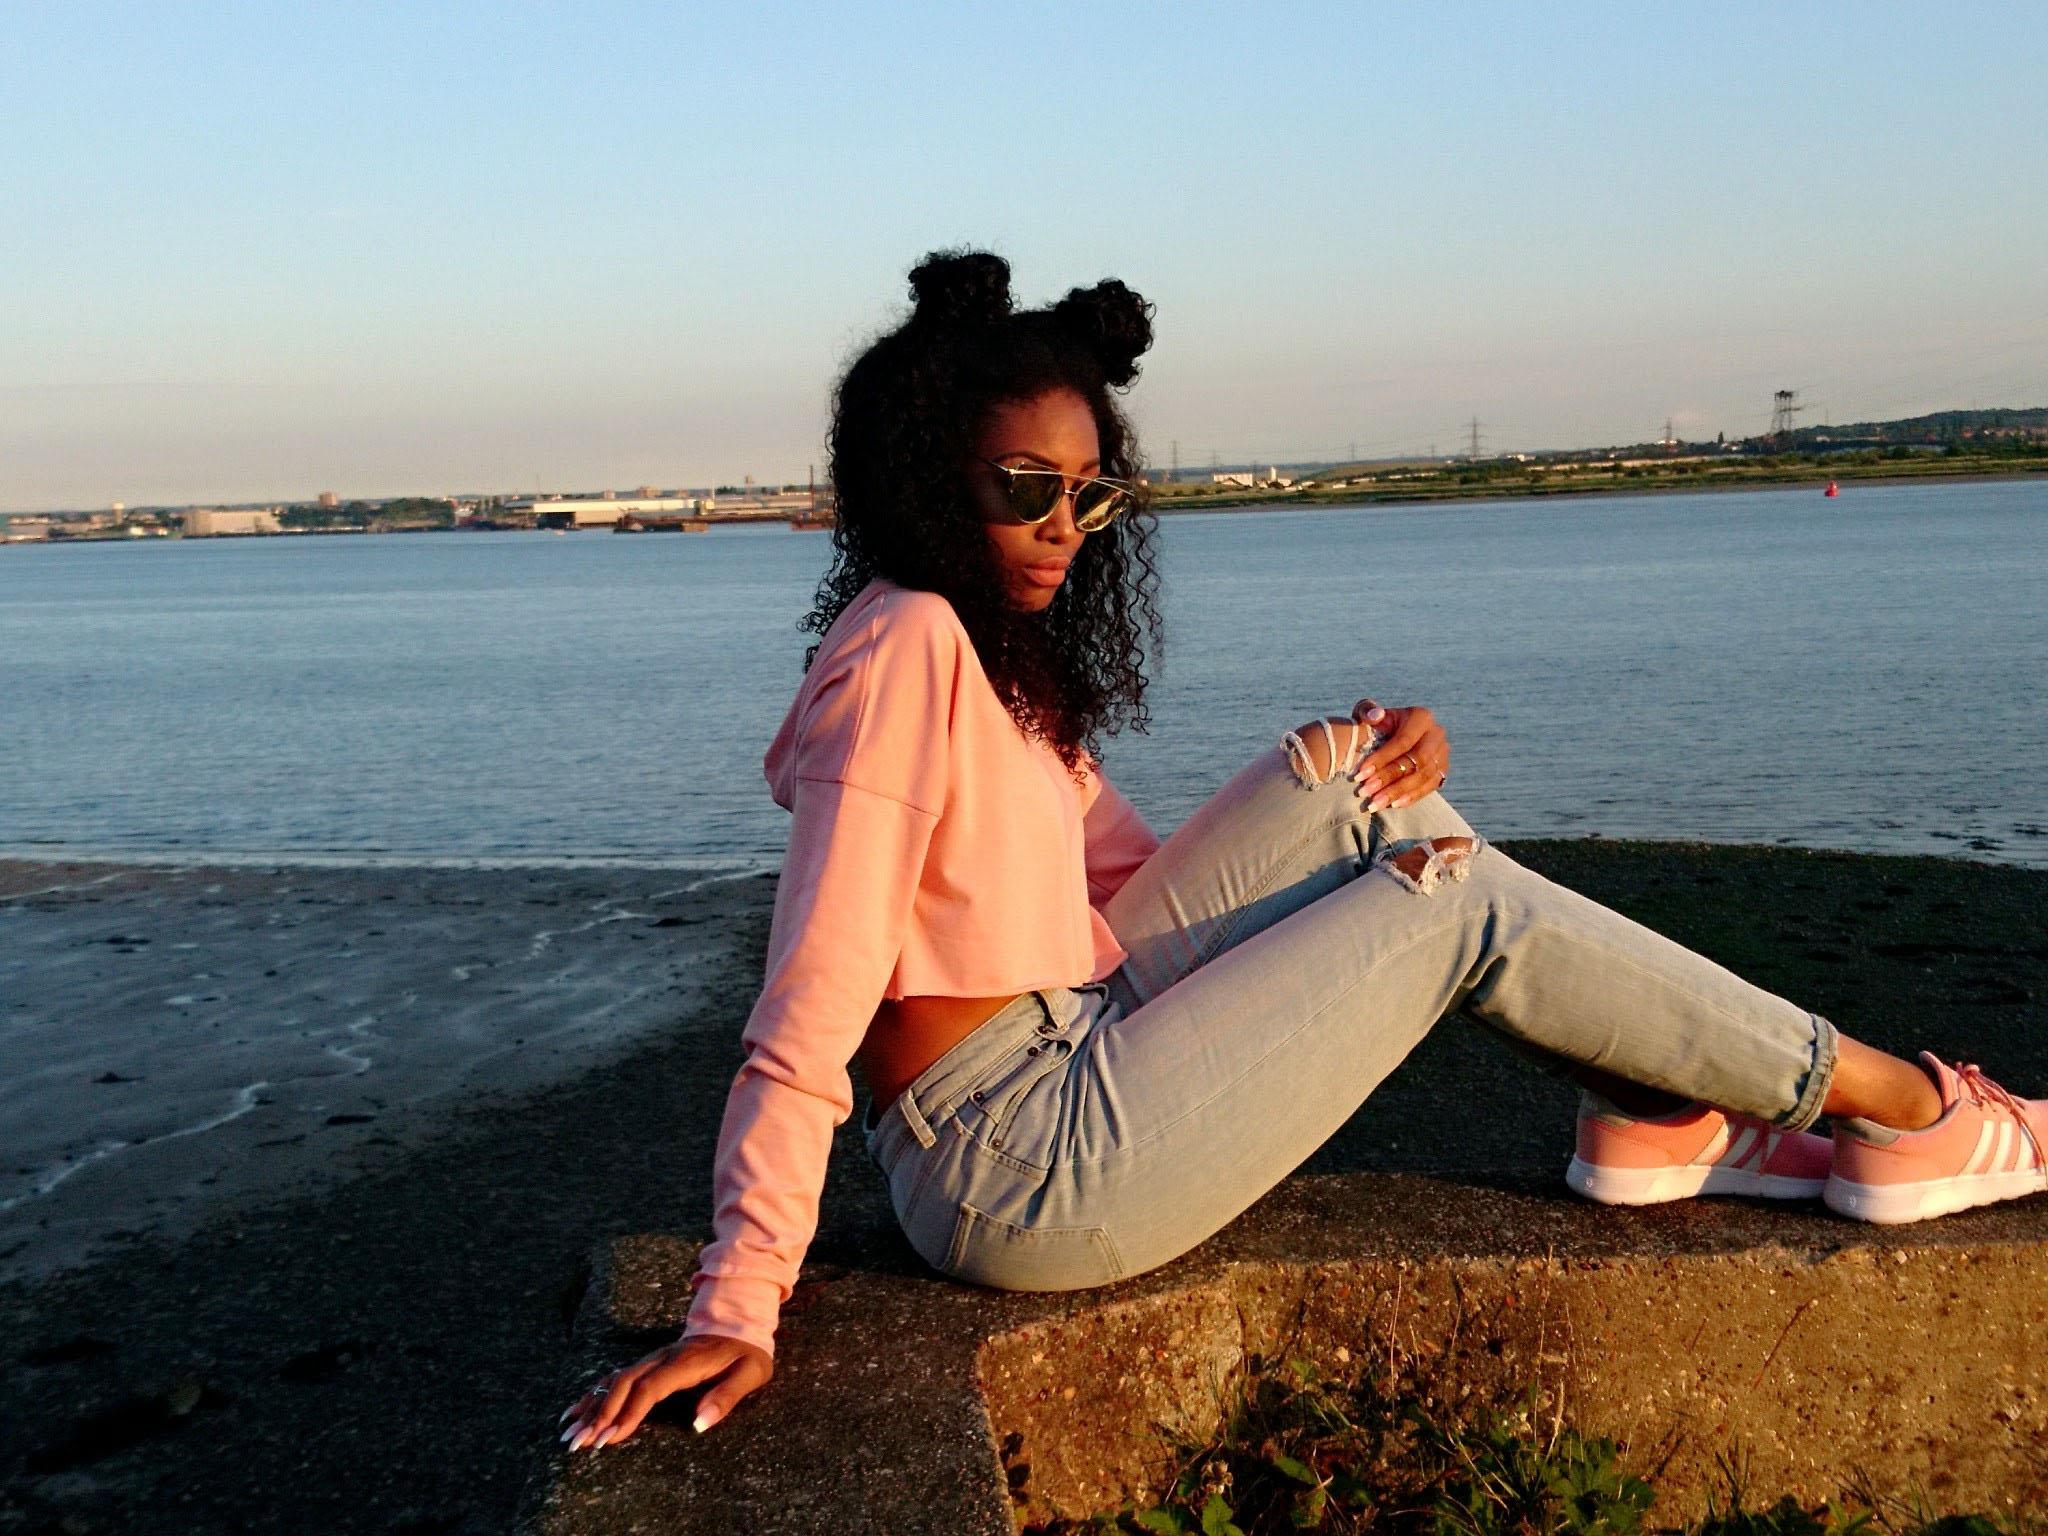 Cropped hoodie - Fashion Prescription    Jeans - ASOS    Trainers - Adidas    Sunglasses - Wish